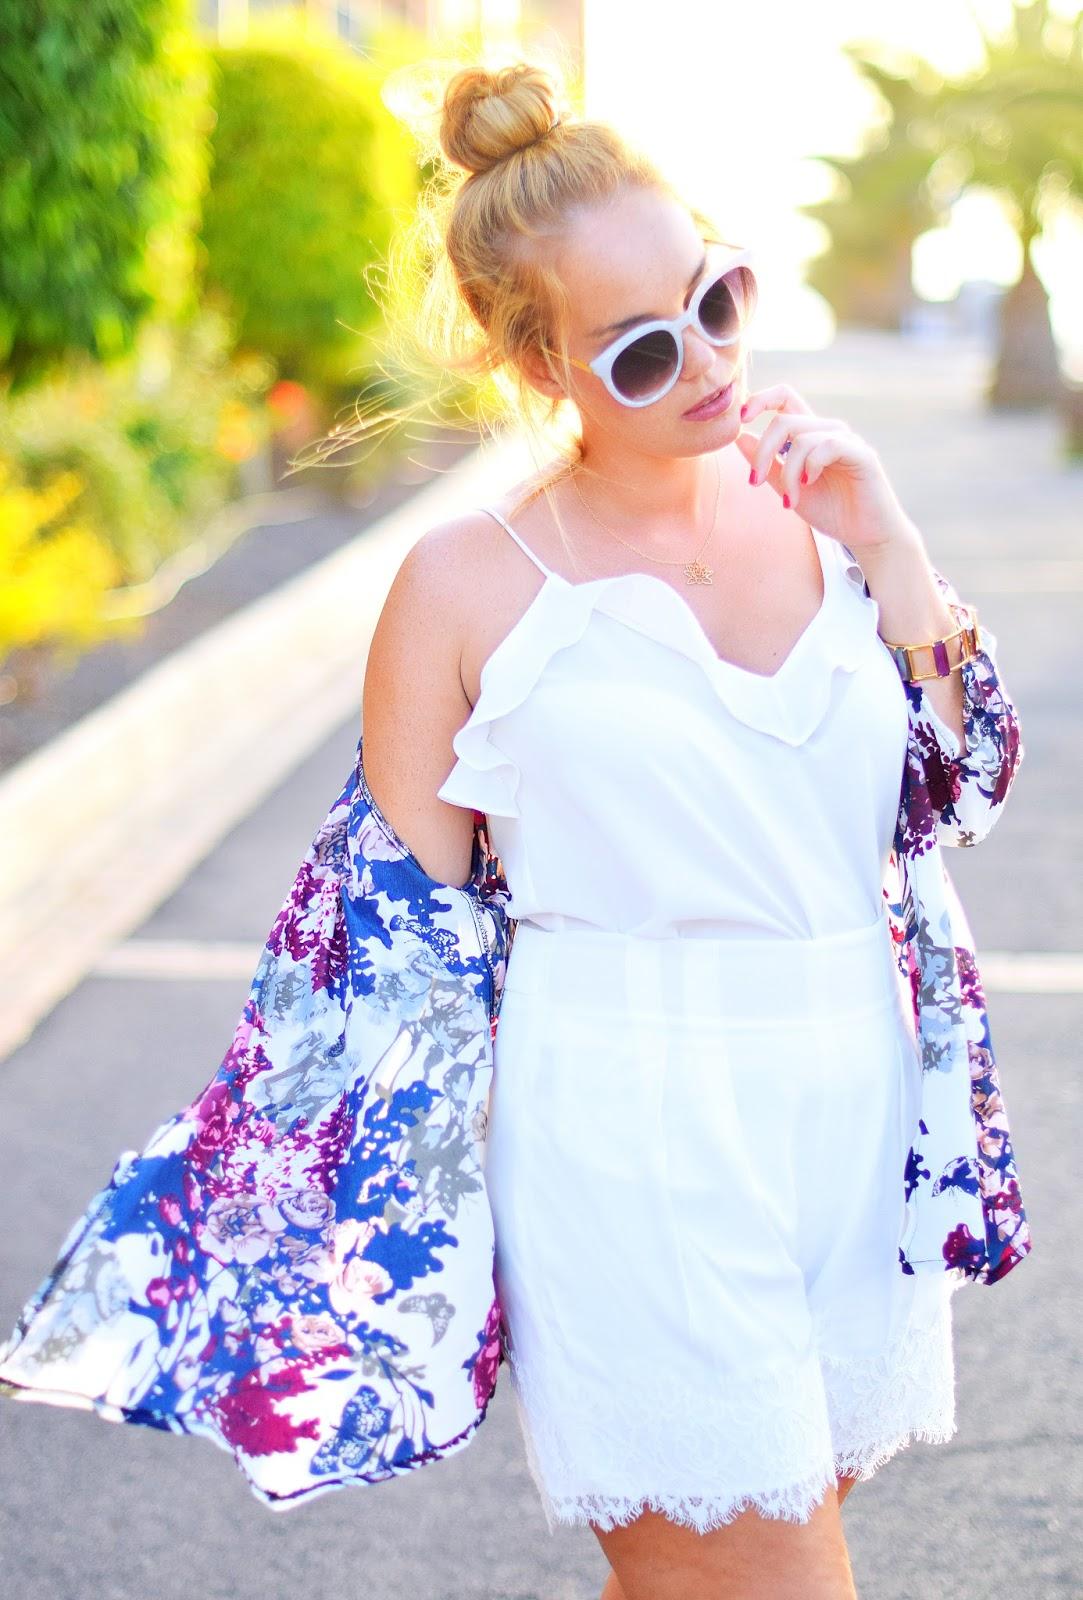 nery hdez, kimono, newchic, carolee, bonny rabbit, zerouv, summer look